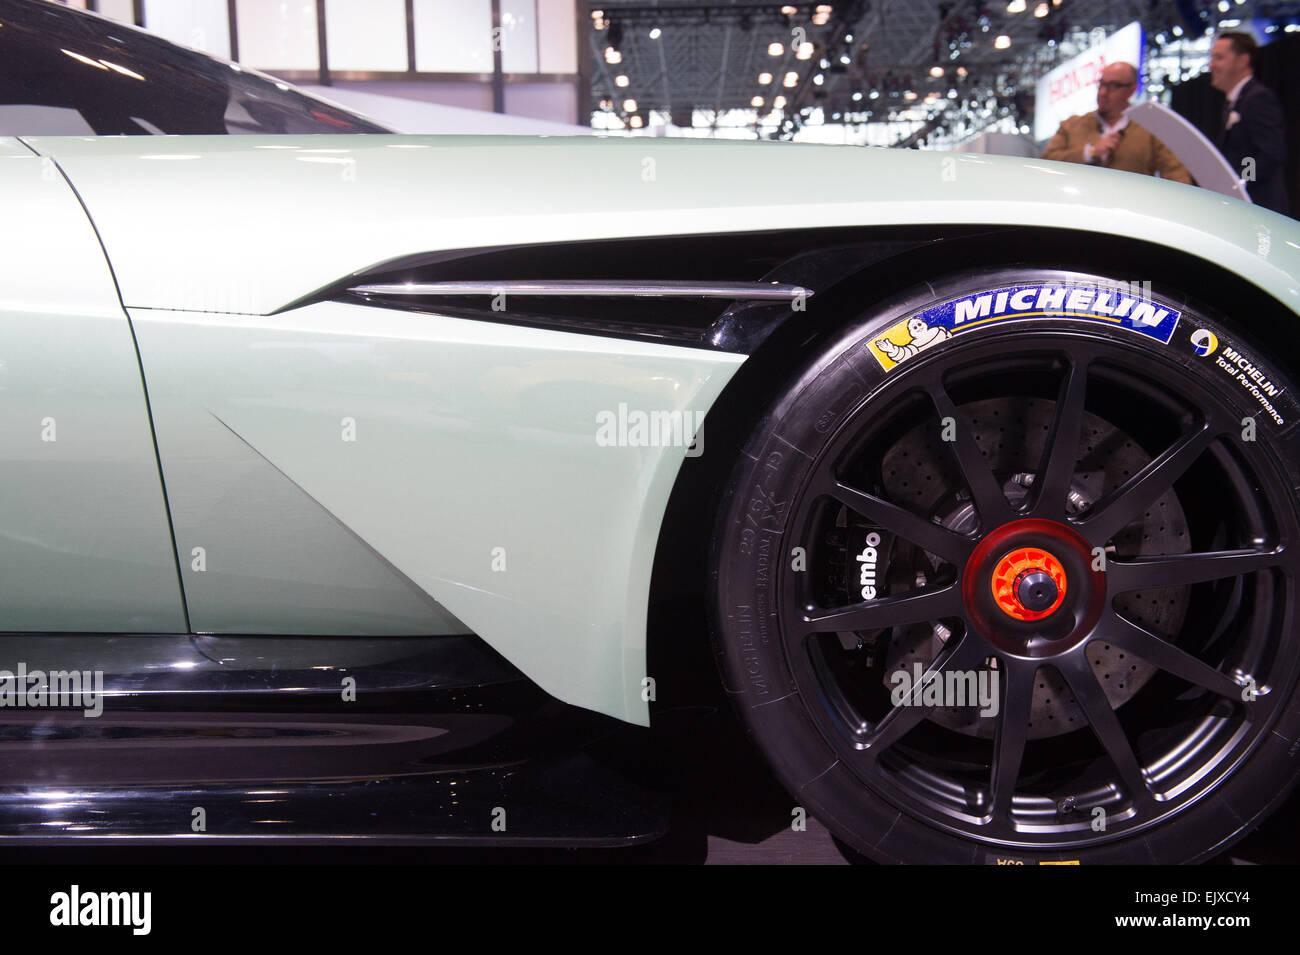 Manhattan, New York, USA. 1st Apr, 2015. Aston Martin Vulcan on display at the 2015 New York International Auto - Stock Image